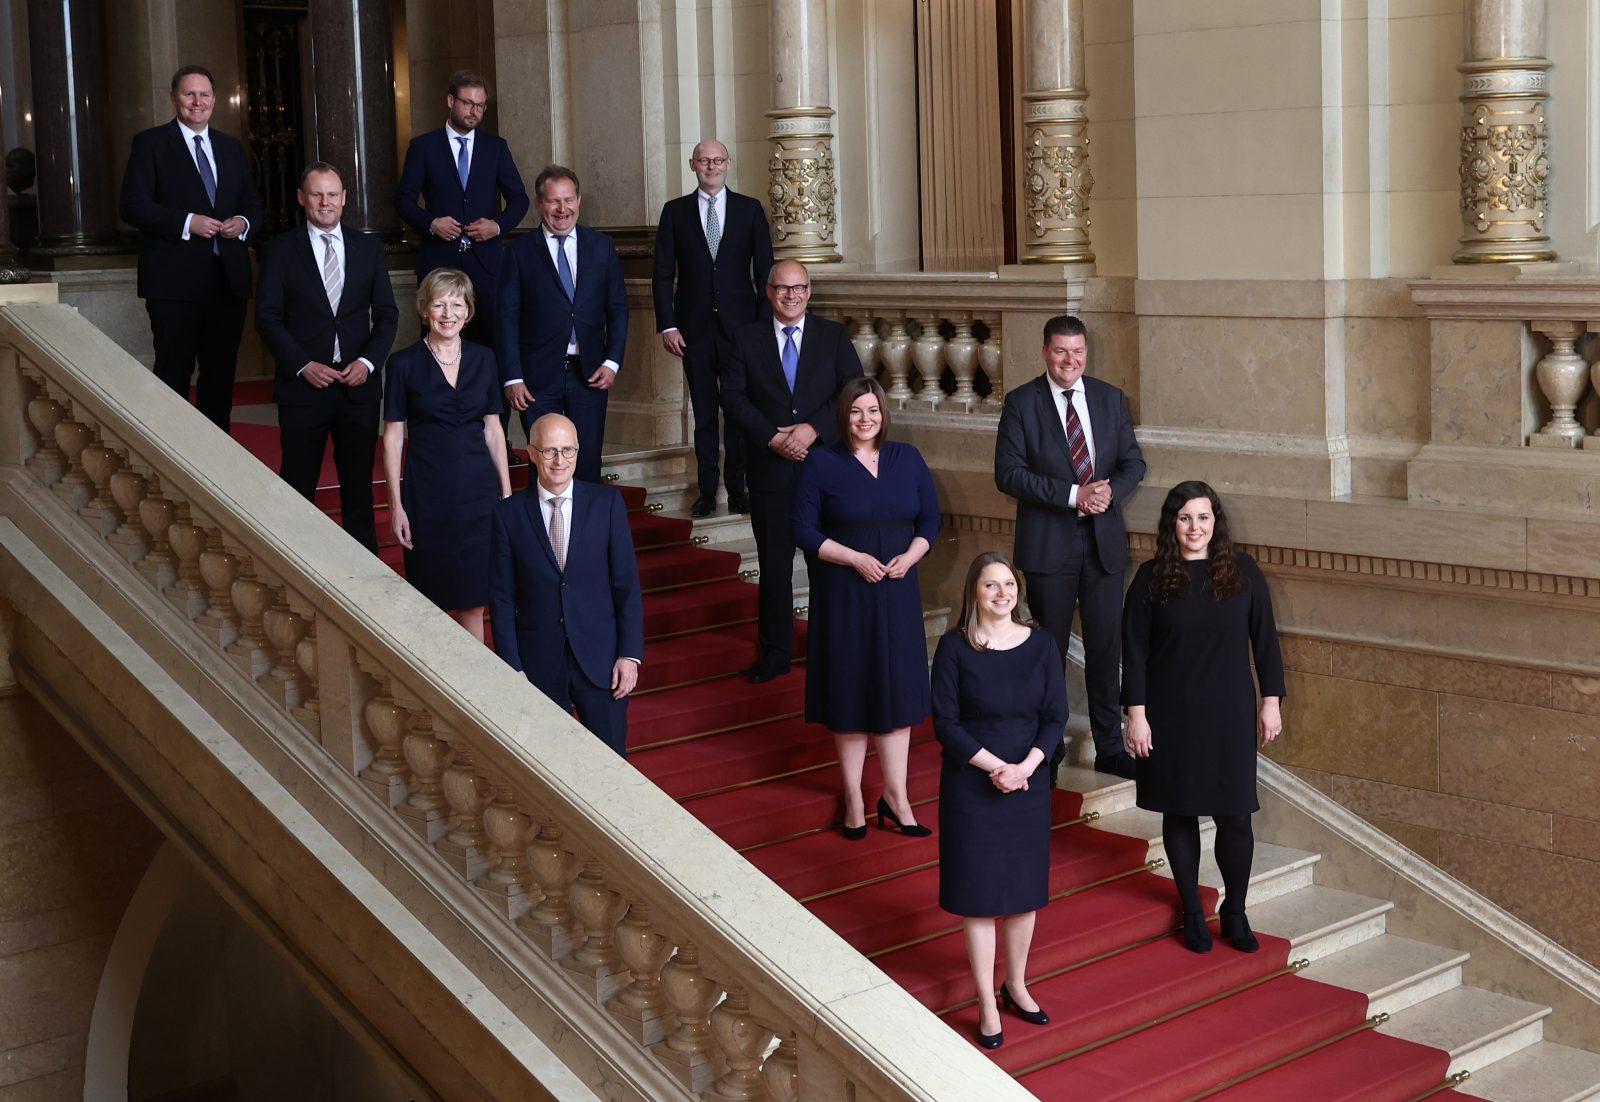 Mitglieder des neuen Hamburger Senats Foto: picture alliance/Christian Charisius/dpa-Pool/dpa